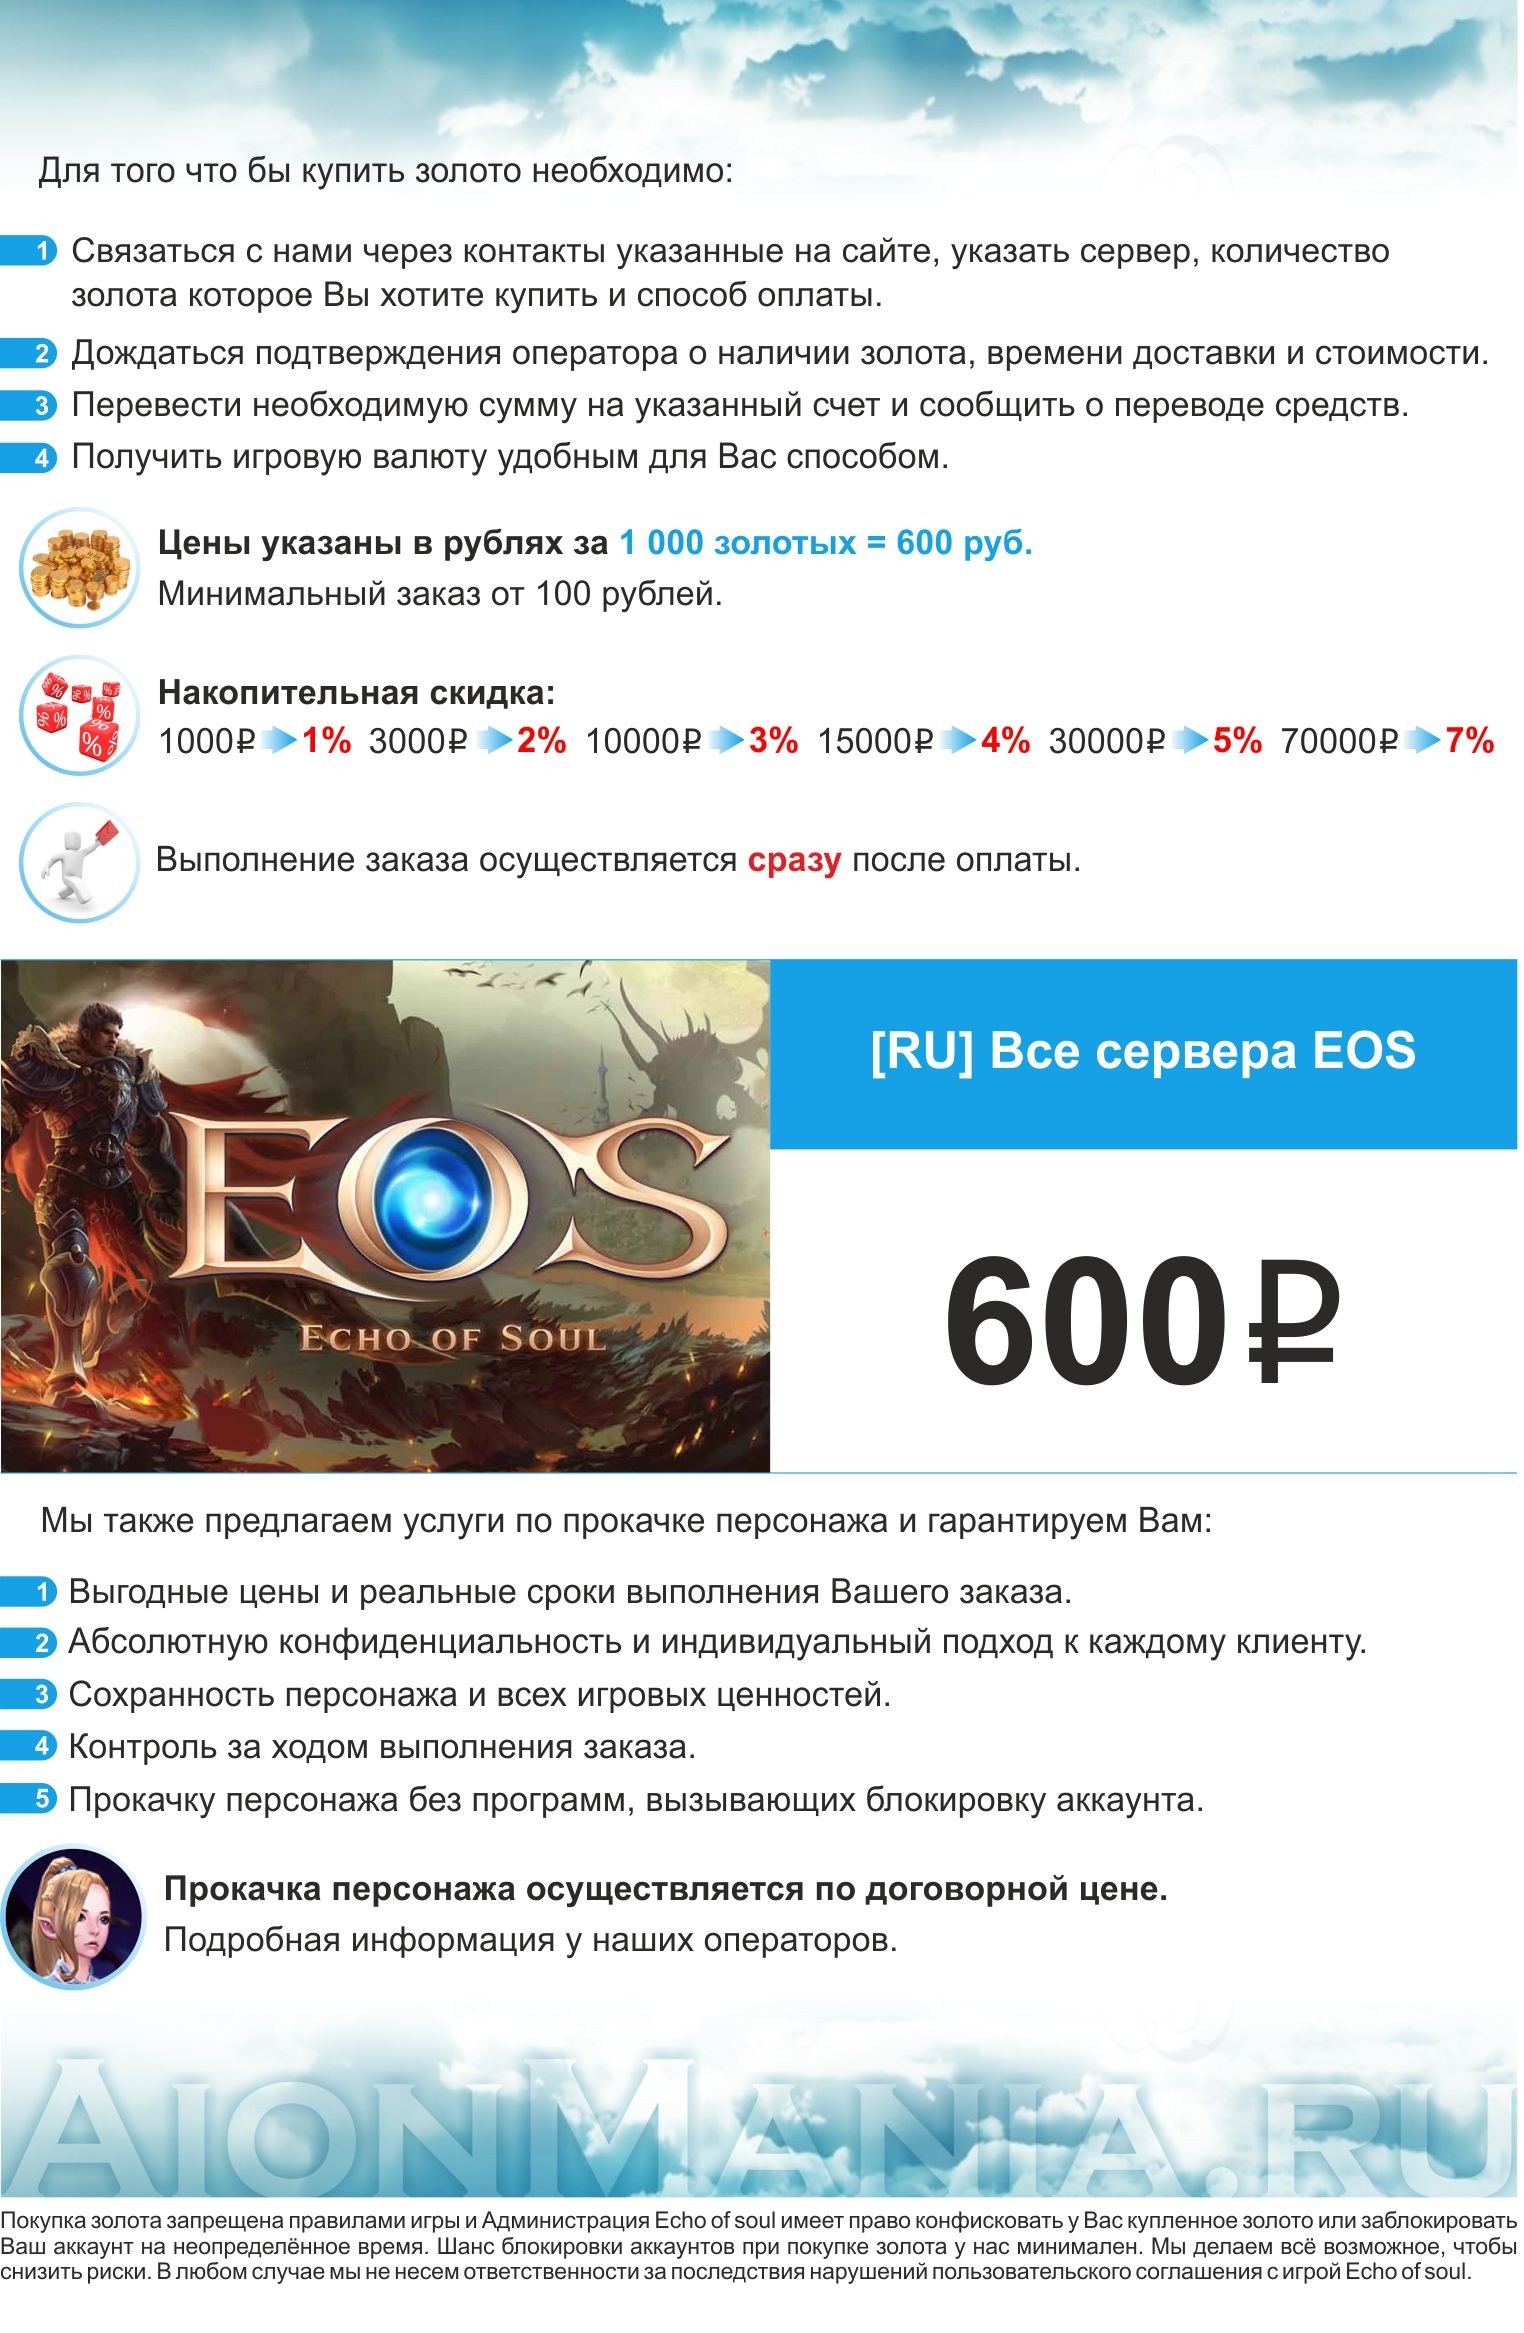 эос600ртим